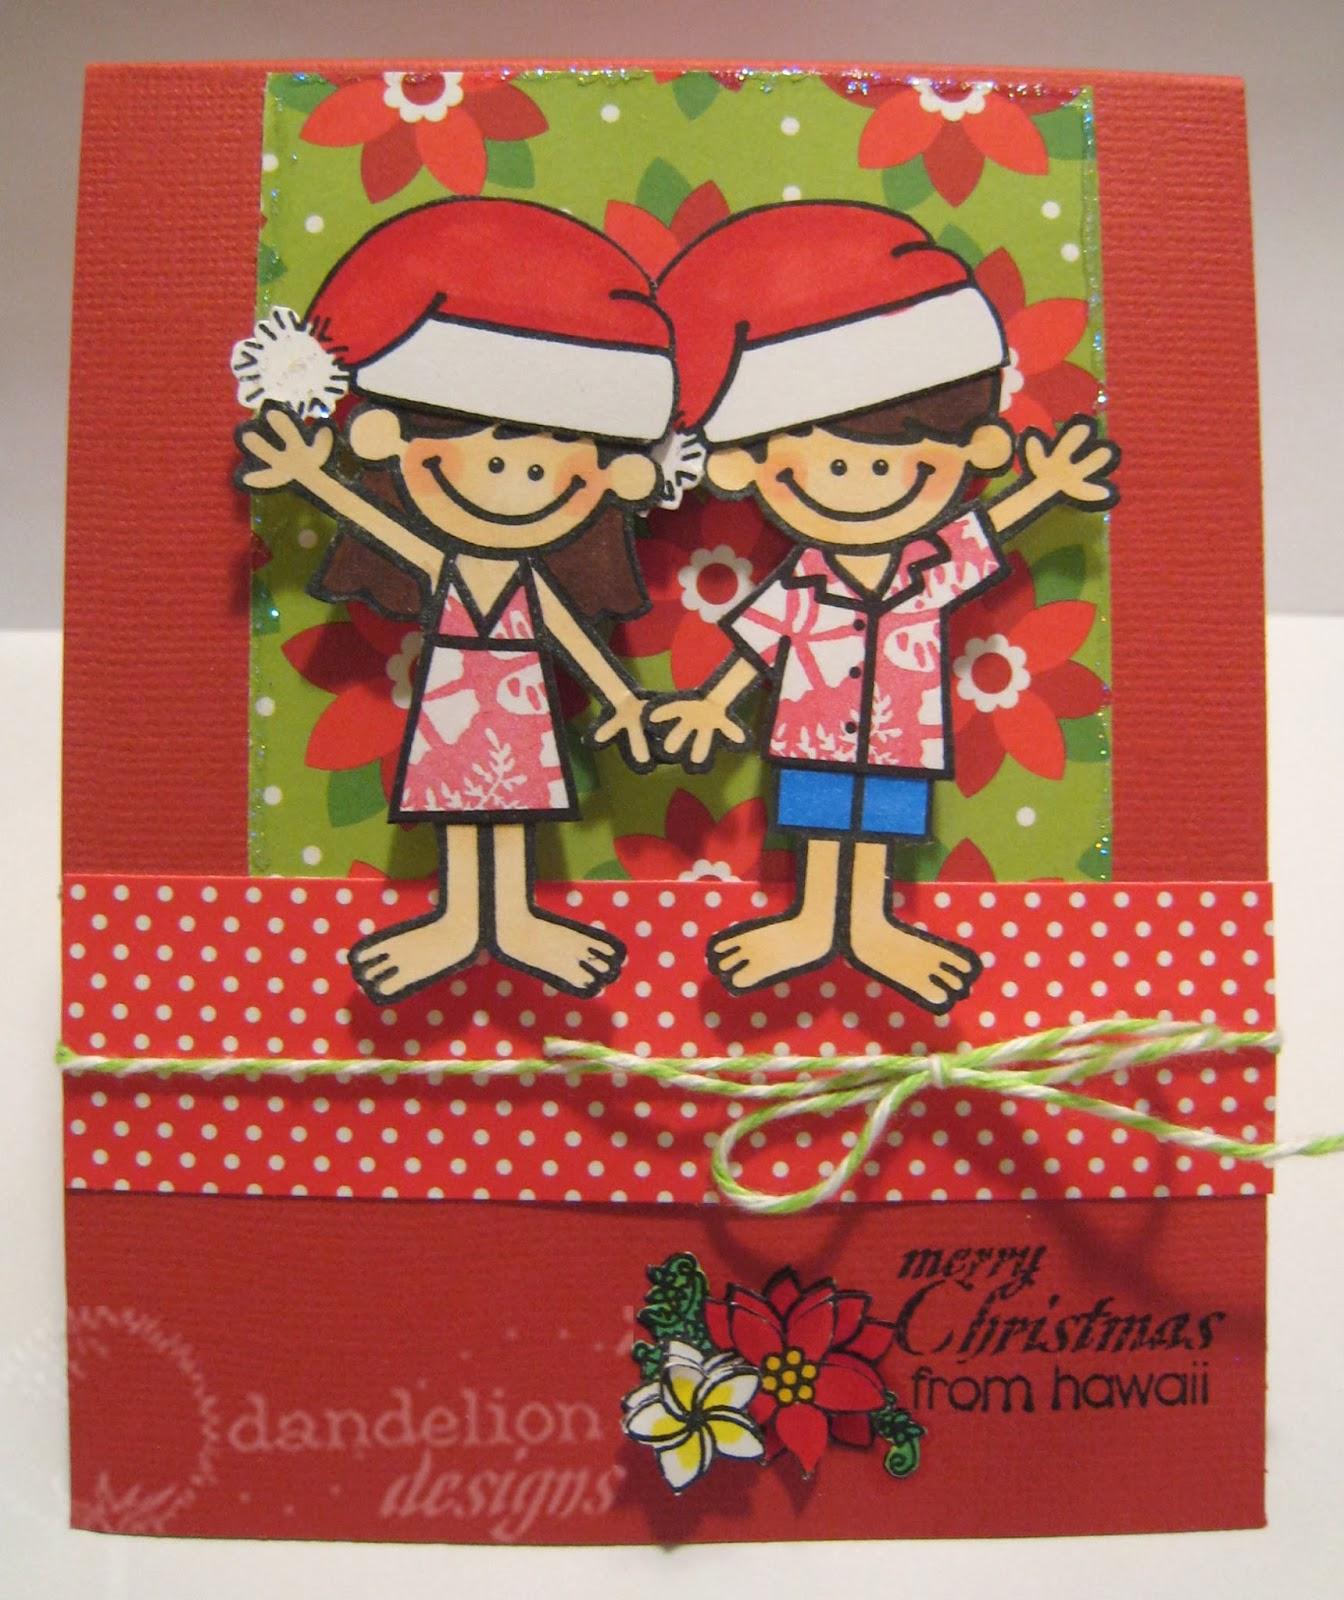 Dandelion Designs Merry Christmas From Hawaii